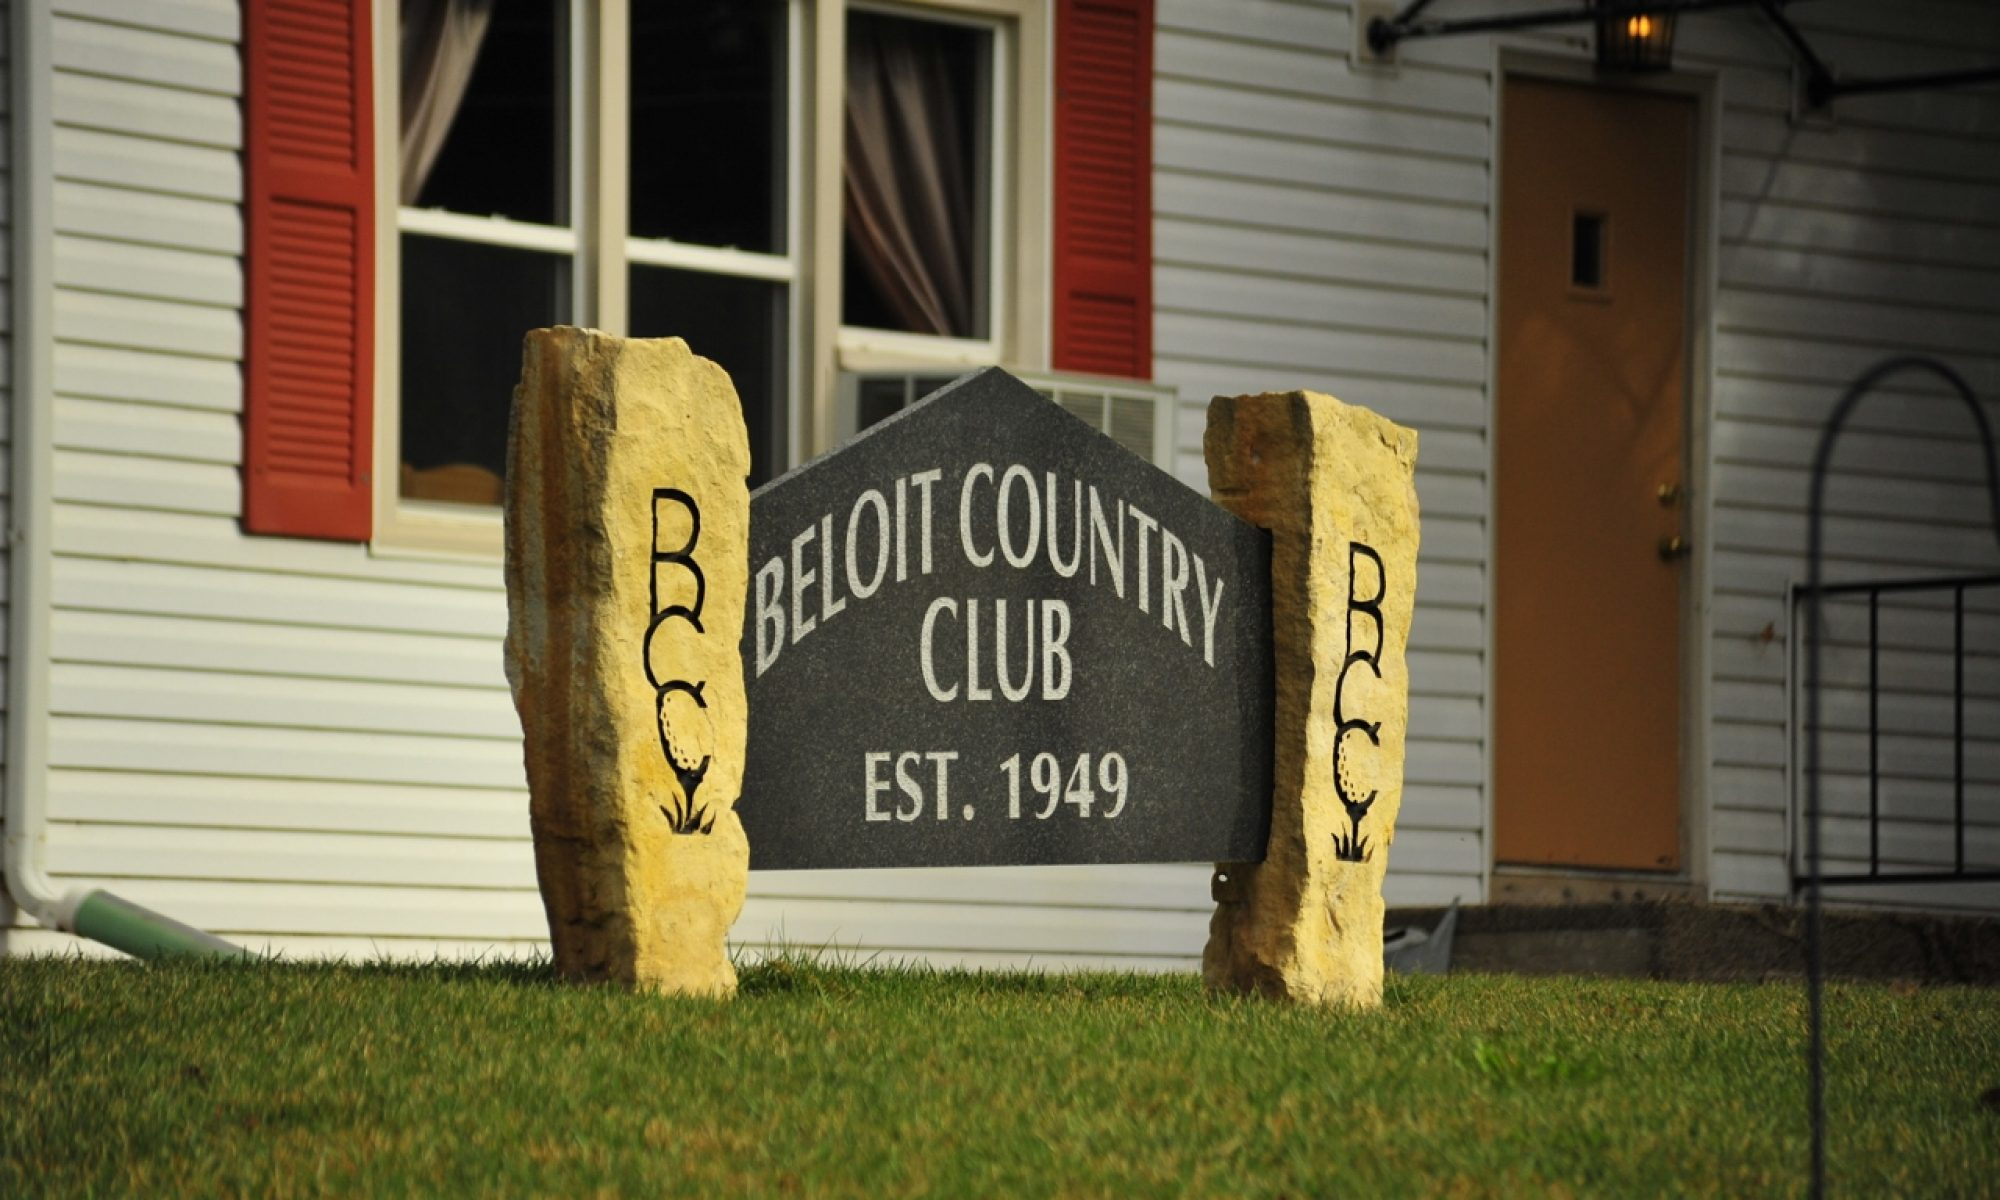 Beloit Country Club